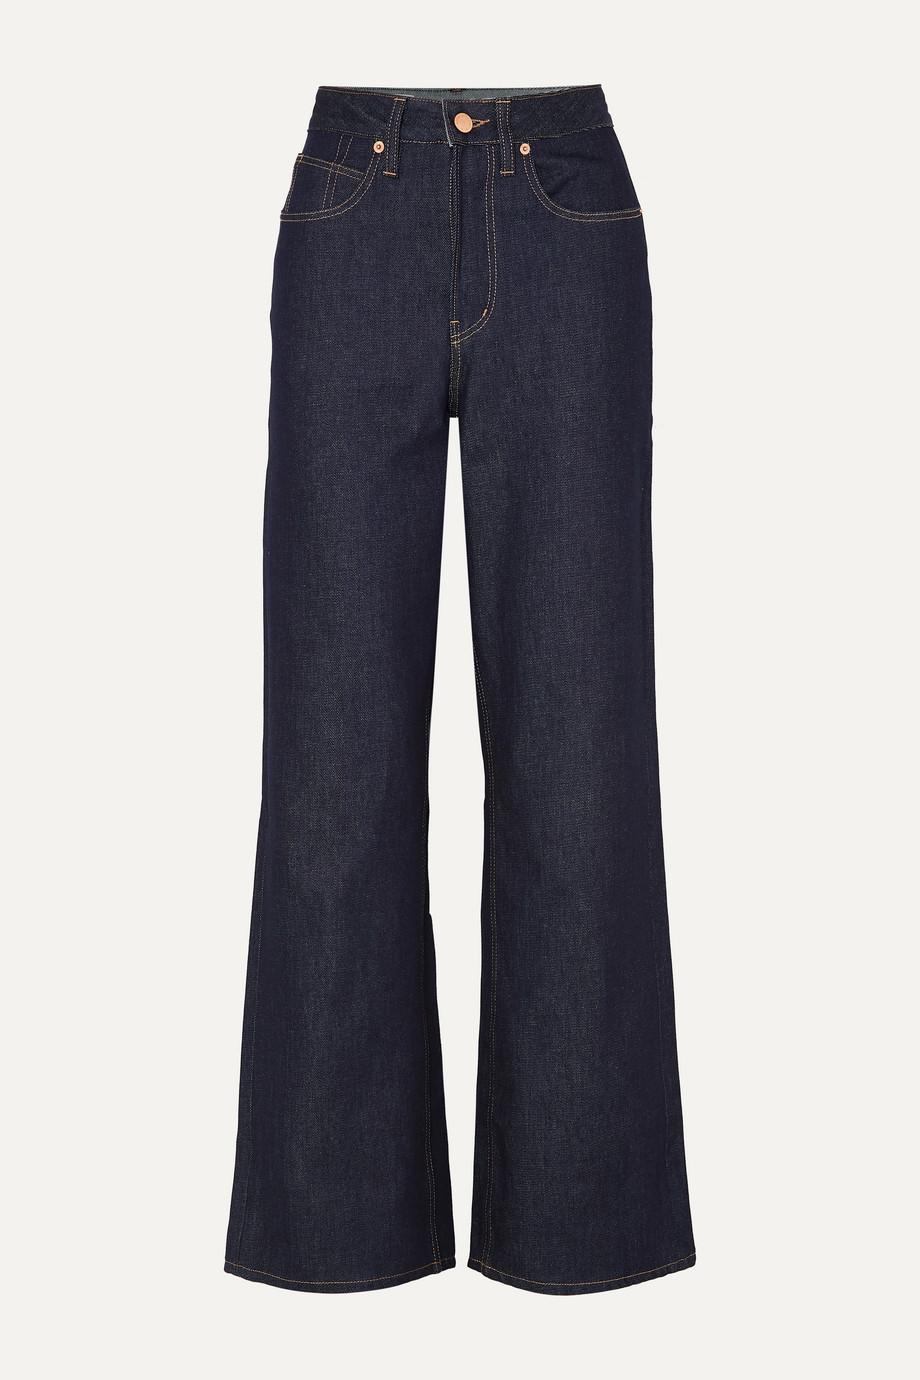 King & Tuckfield Kathleen high-rise wide-leg jeans